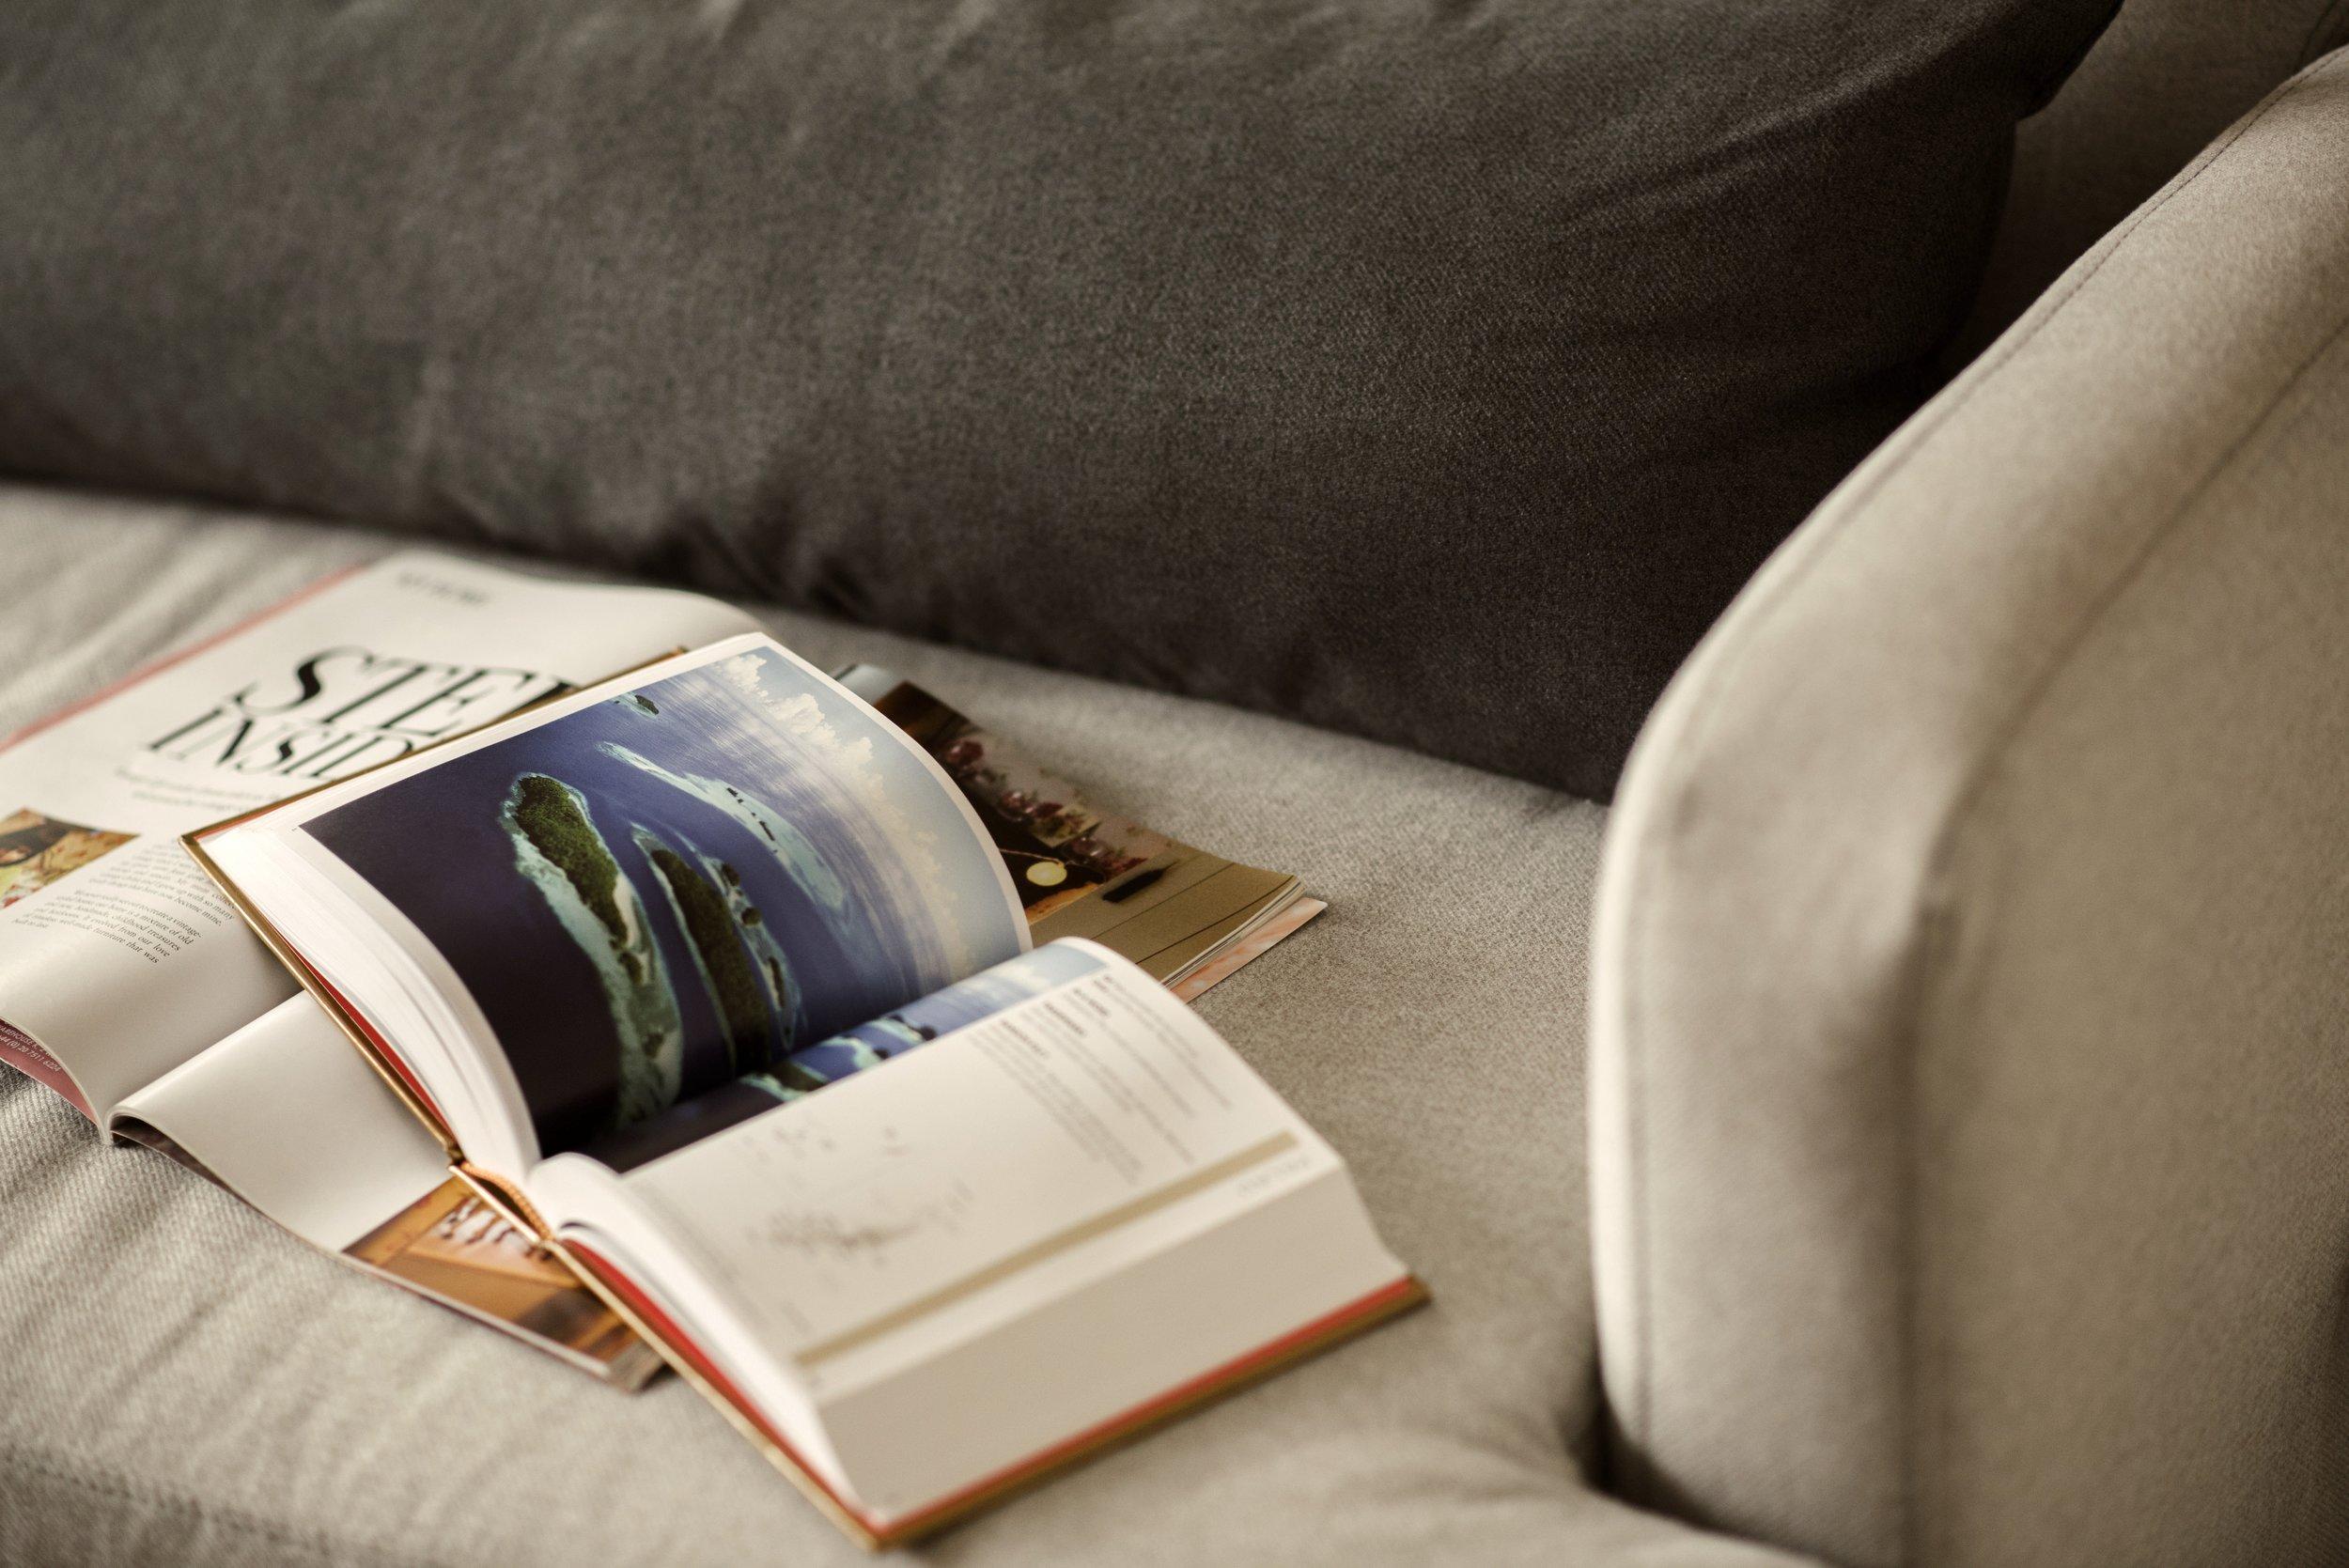 book-bindings-books-couch-1166425.jpg